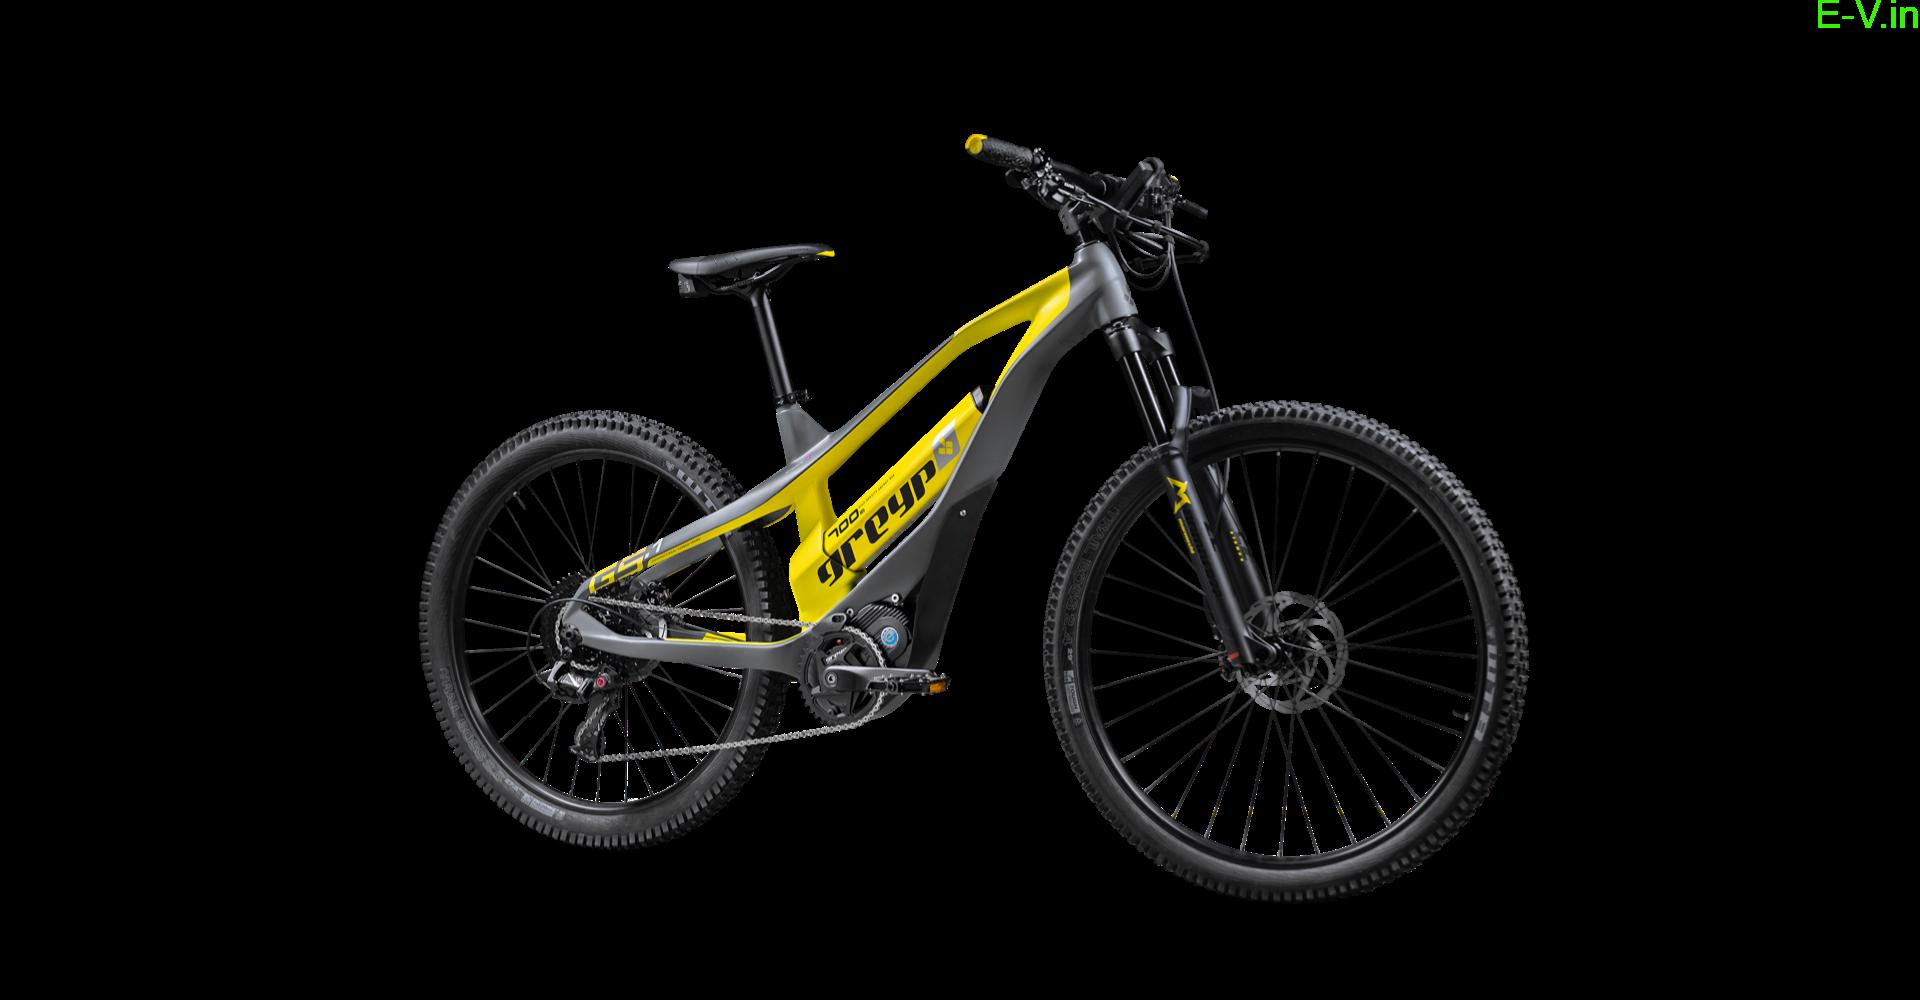 greyp g 5.1electyric bicycle